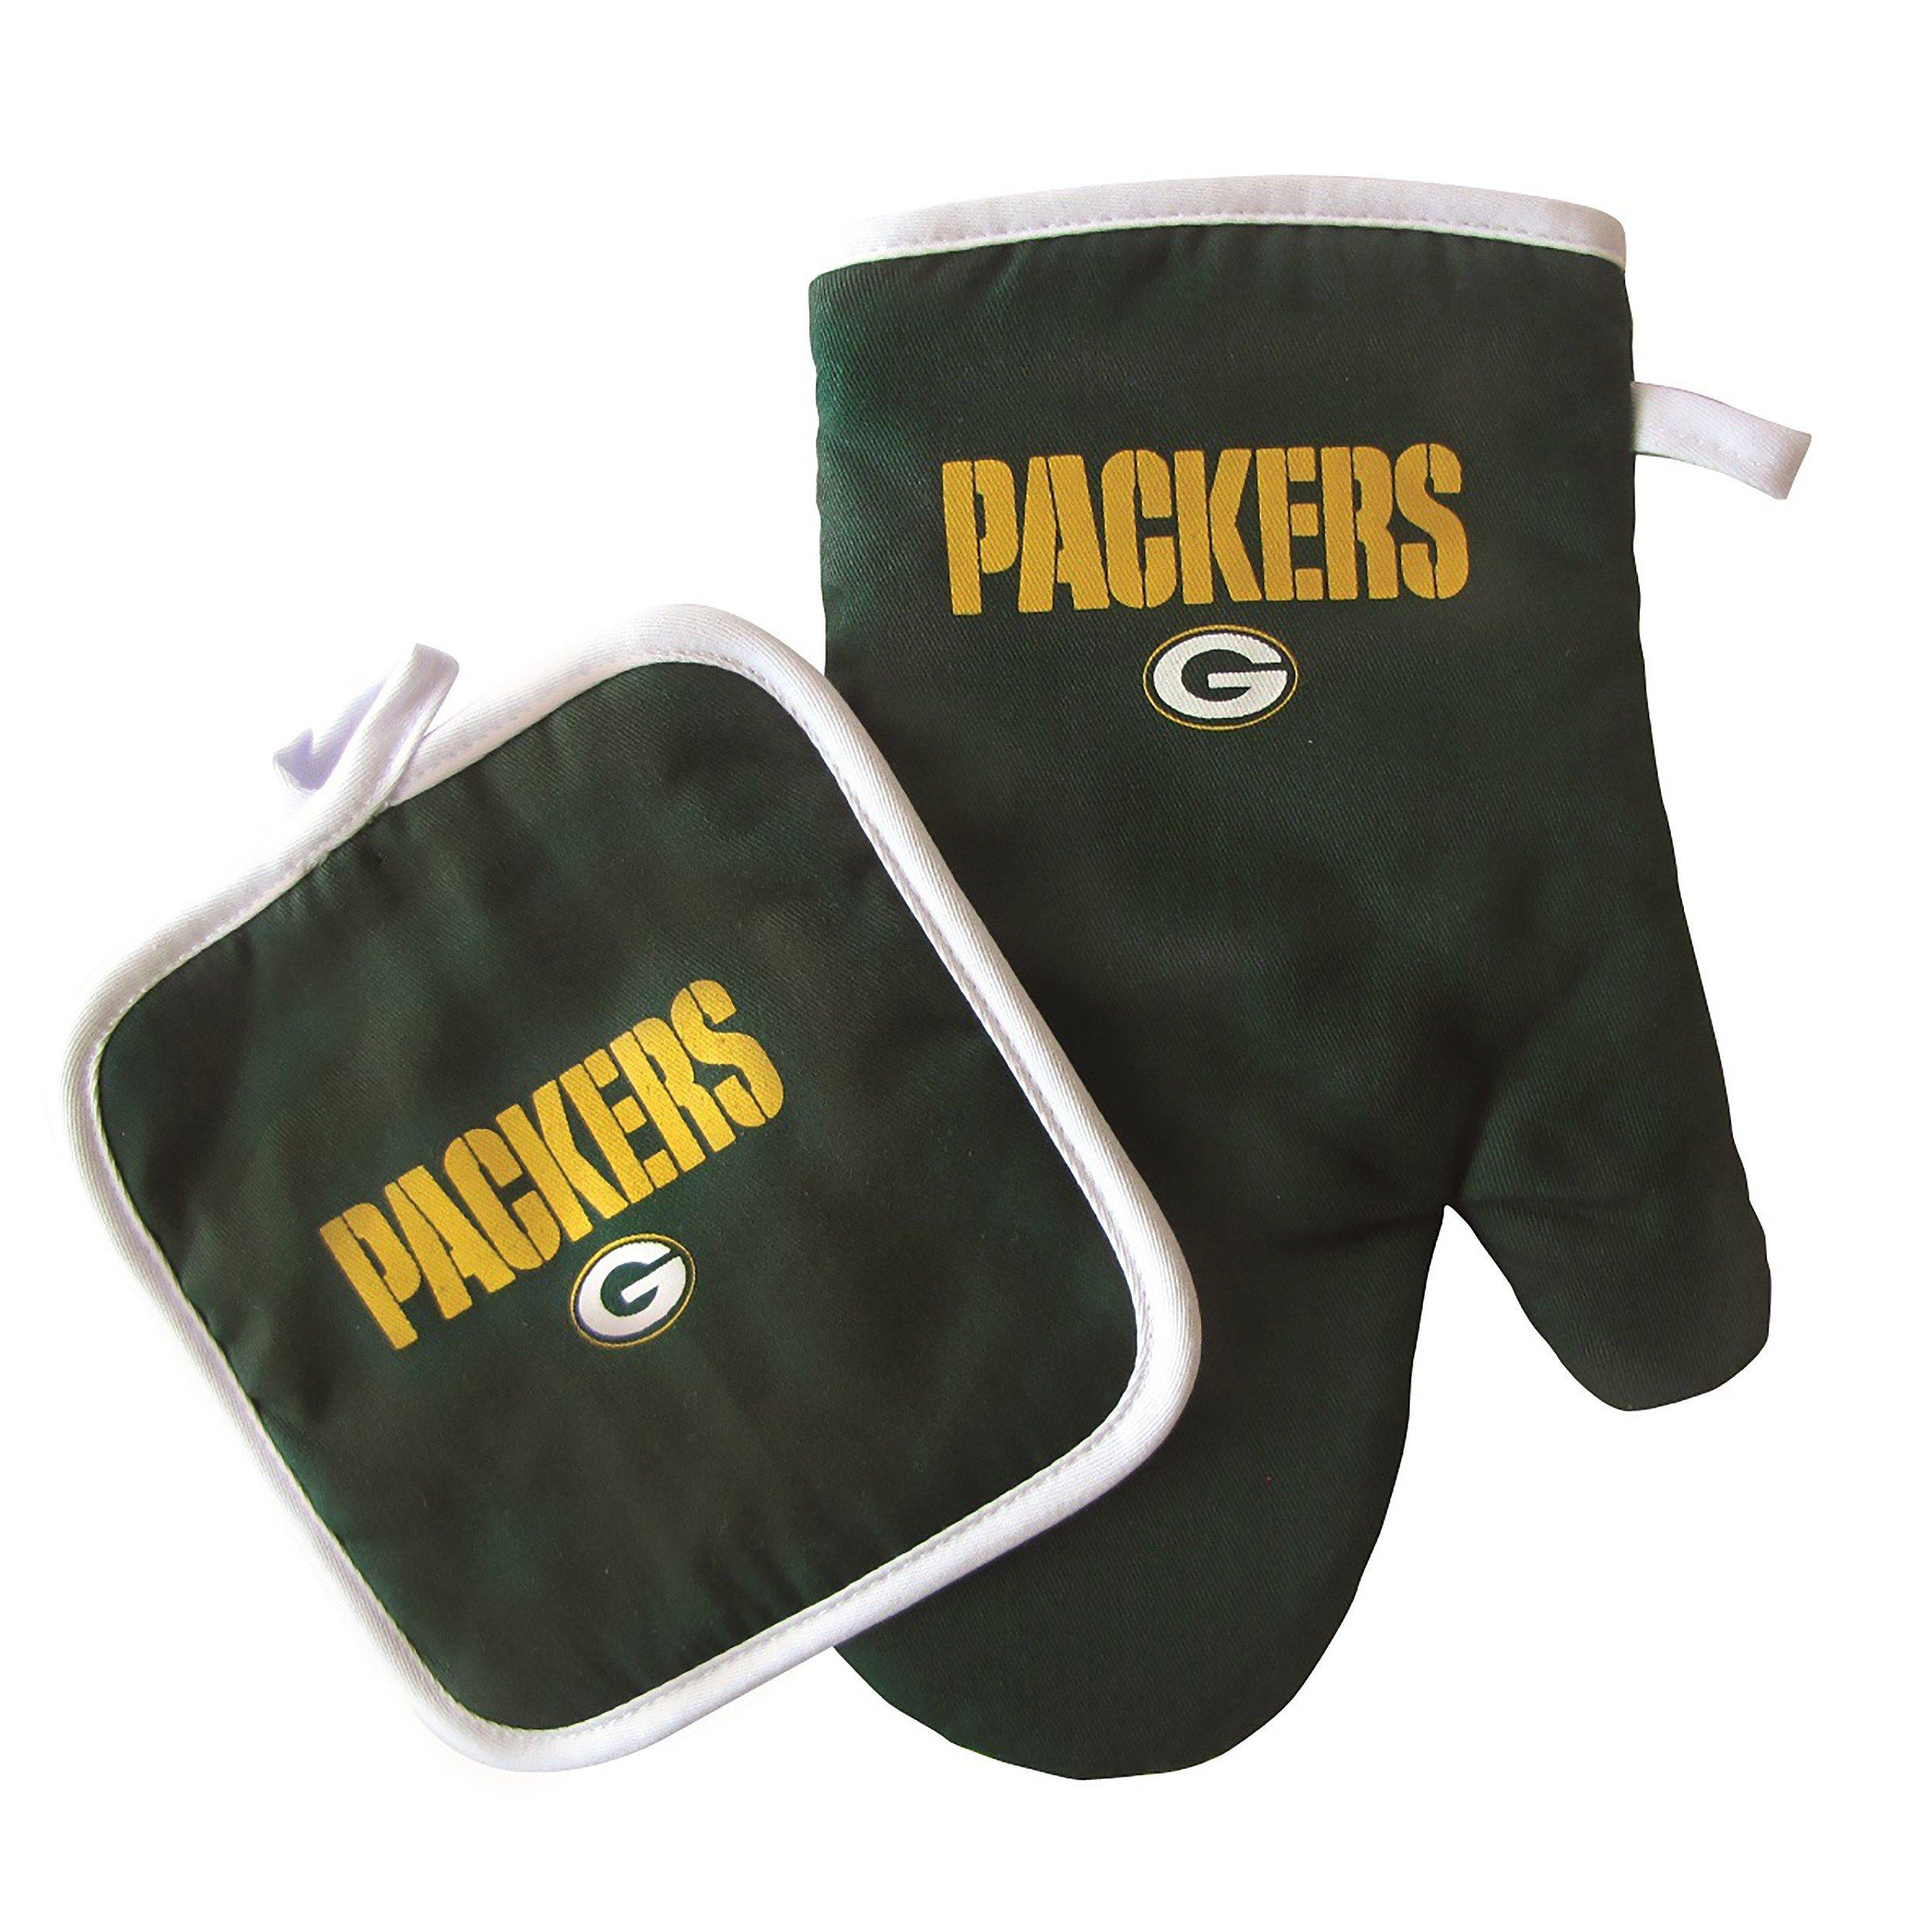 NFL Green Bay Packers Logo Oven Mitt & Pot Holder, One Size, Green